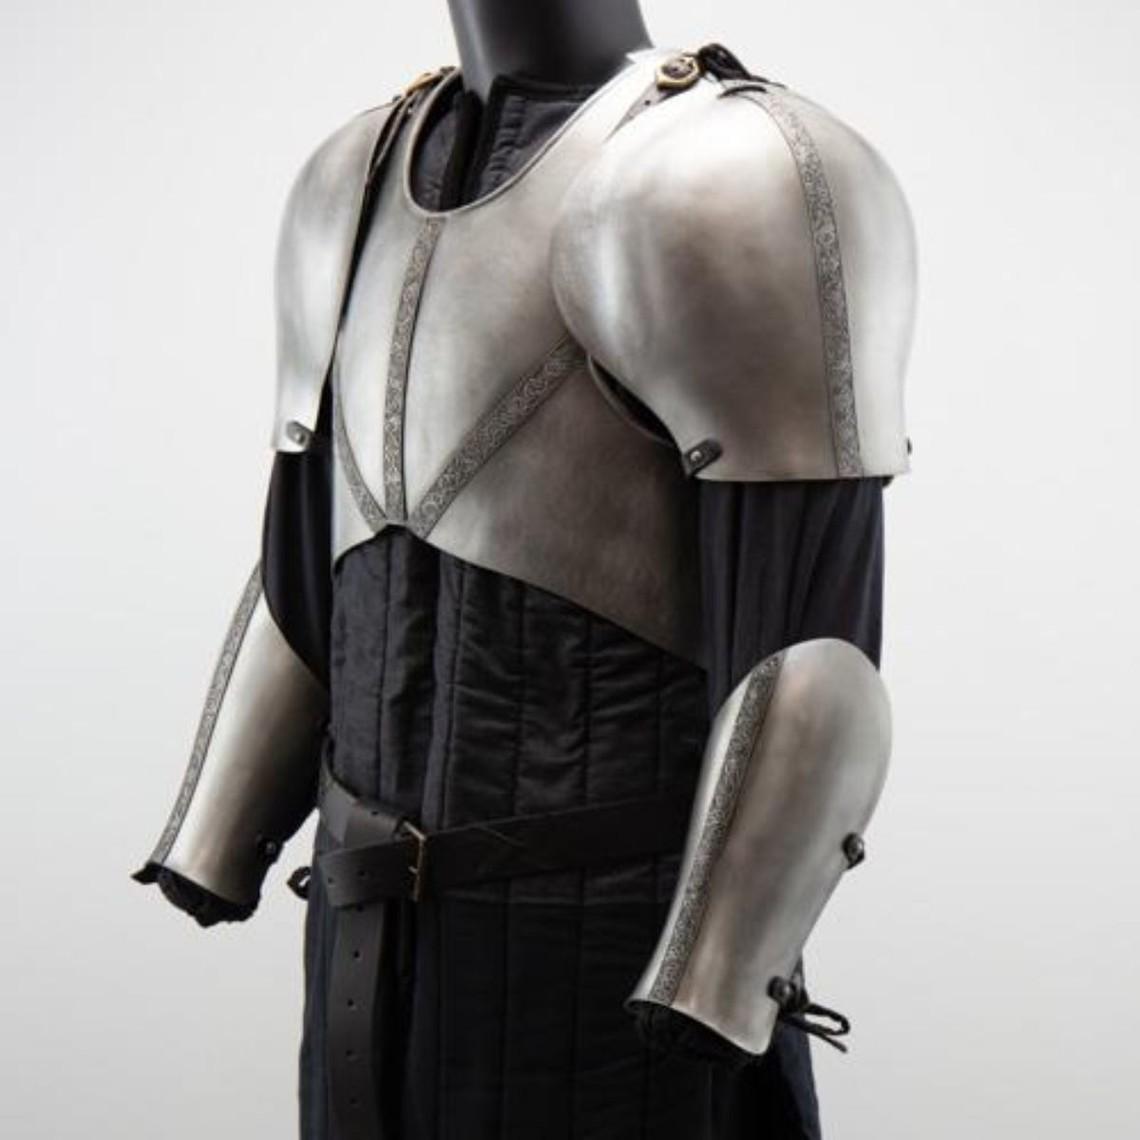 Epic Armoury coraza LARP nórdica de Viking